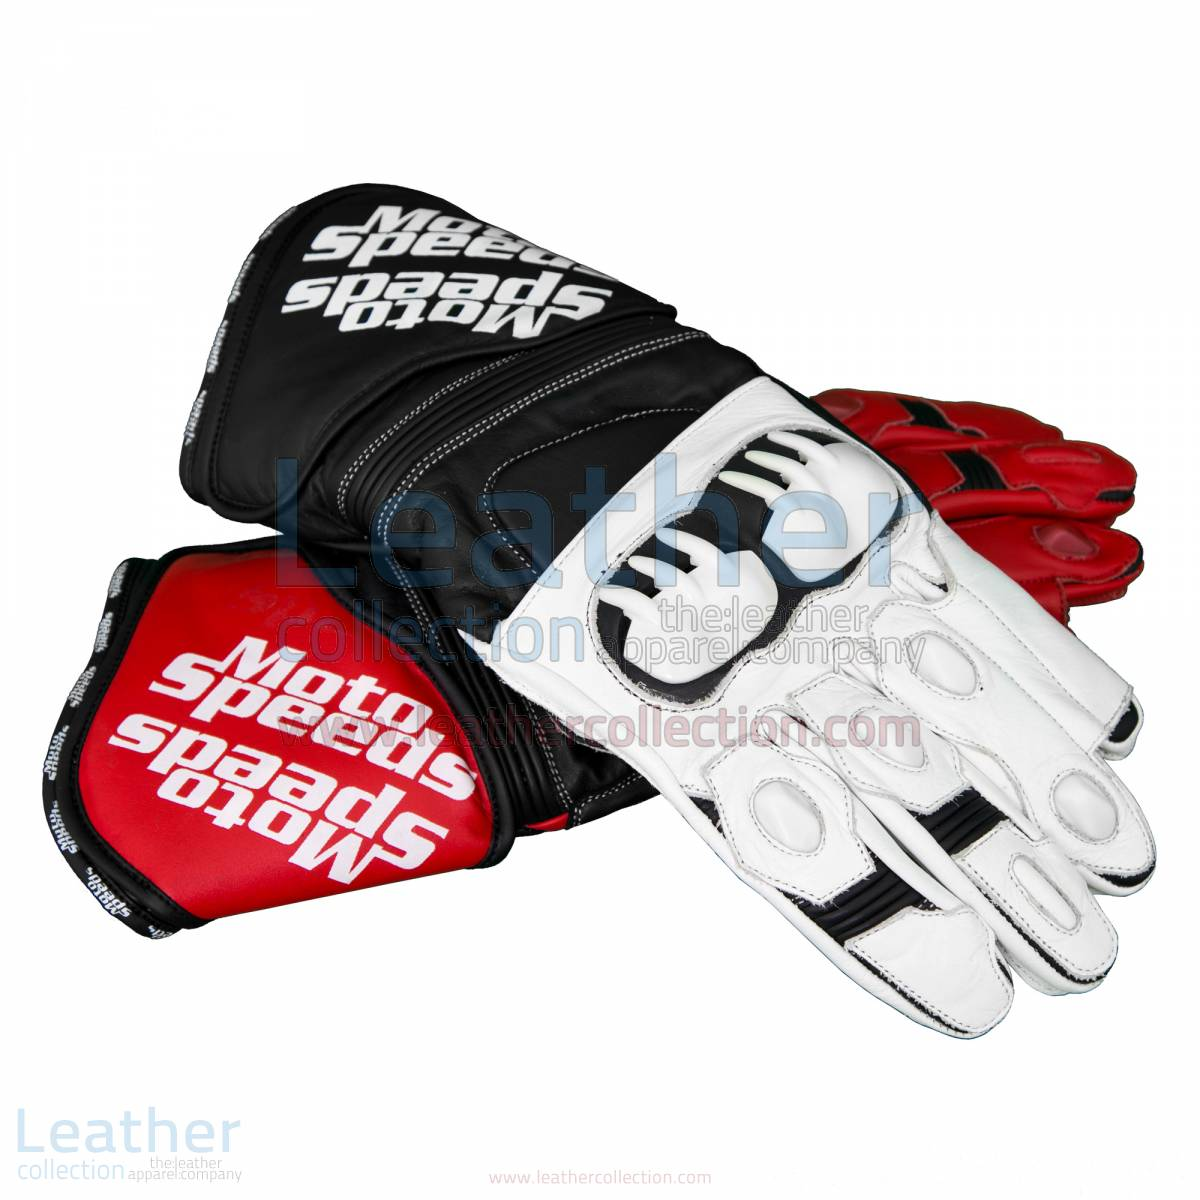 jorge lorenzo motogp 2013 race gloves